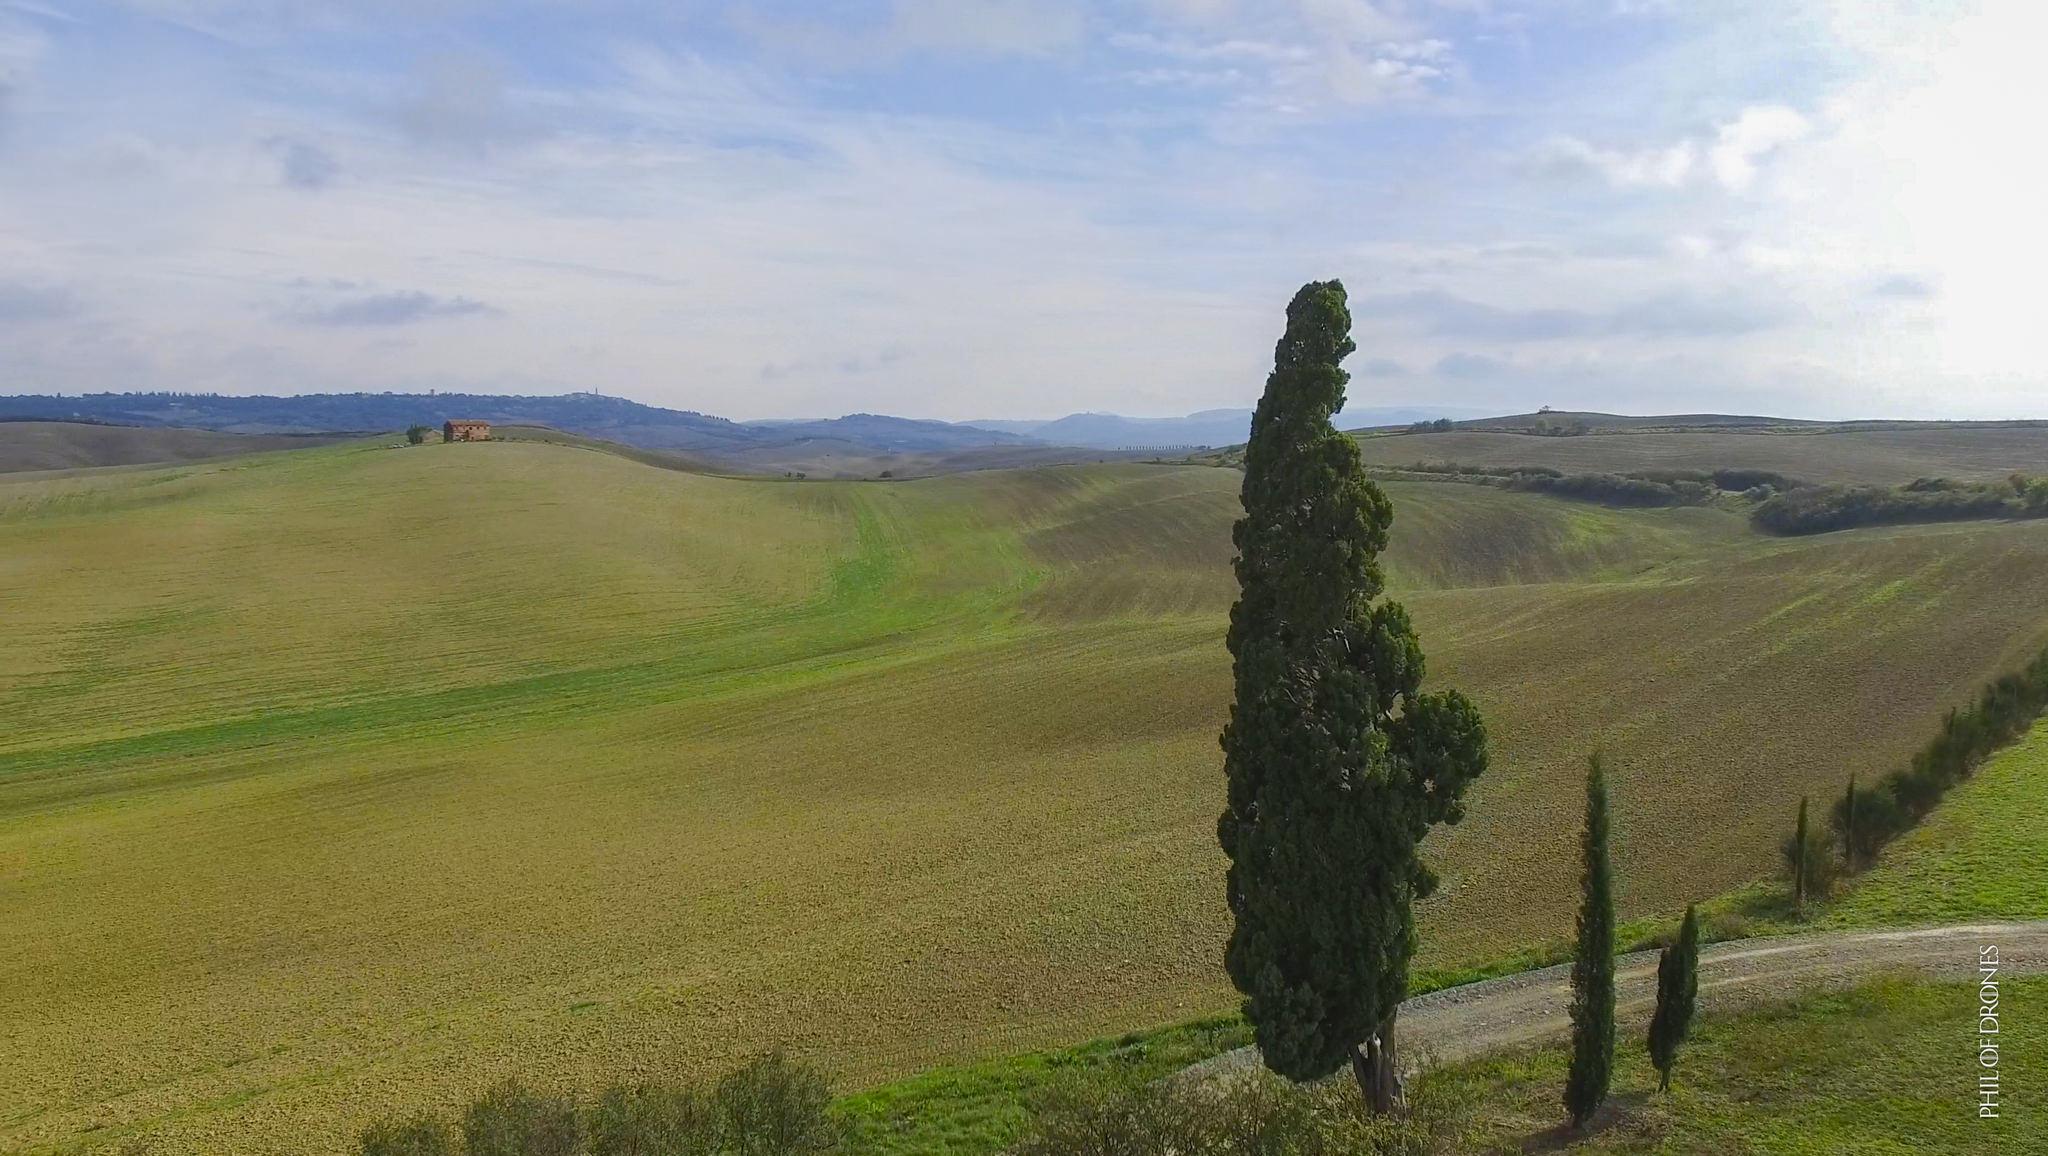 Toscane 2015-4-PhM-4.jpg